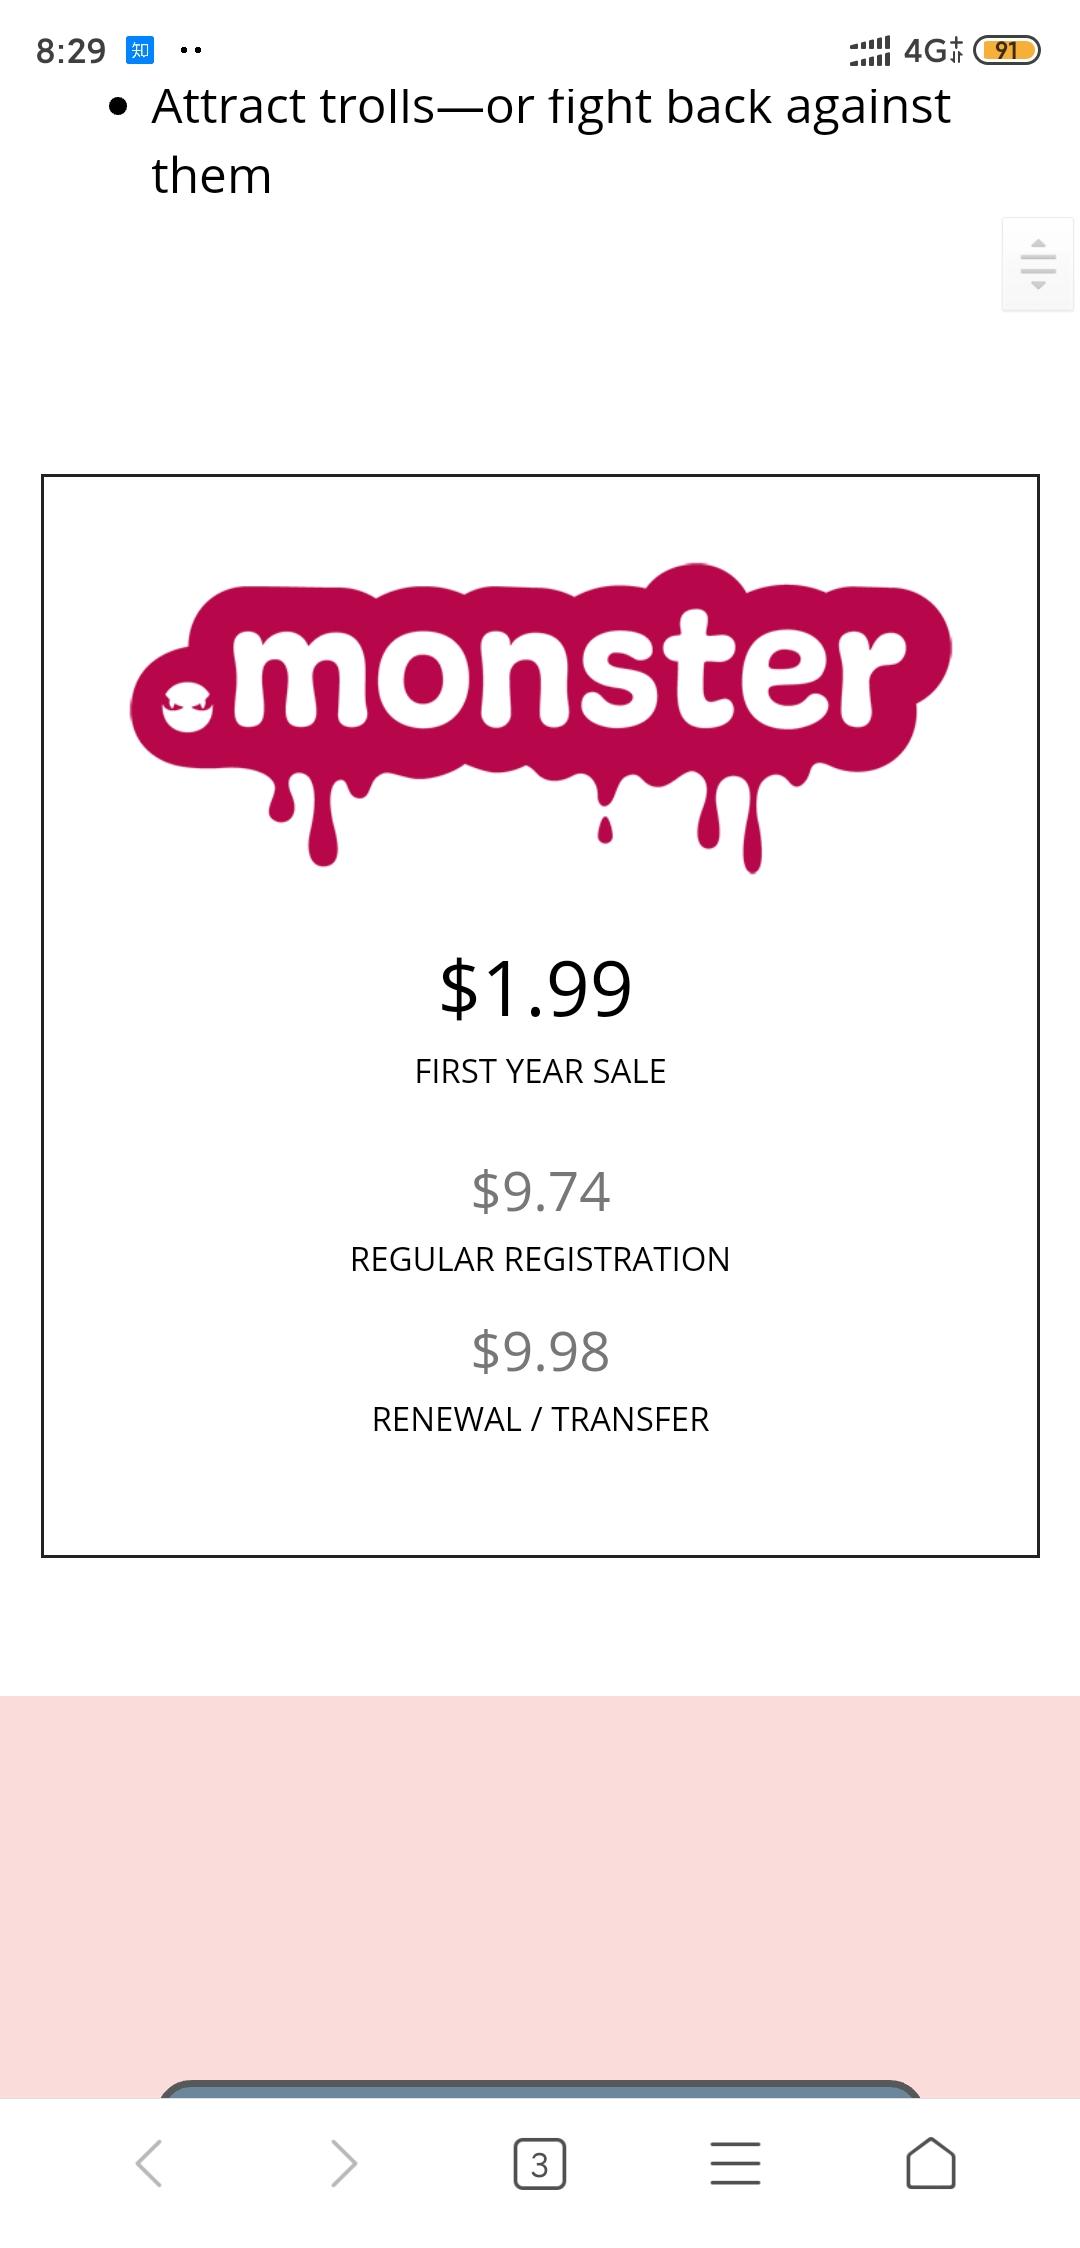 .monster域名优惠/namesilo首年0.99美元/porkbun首年1.99美元